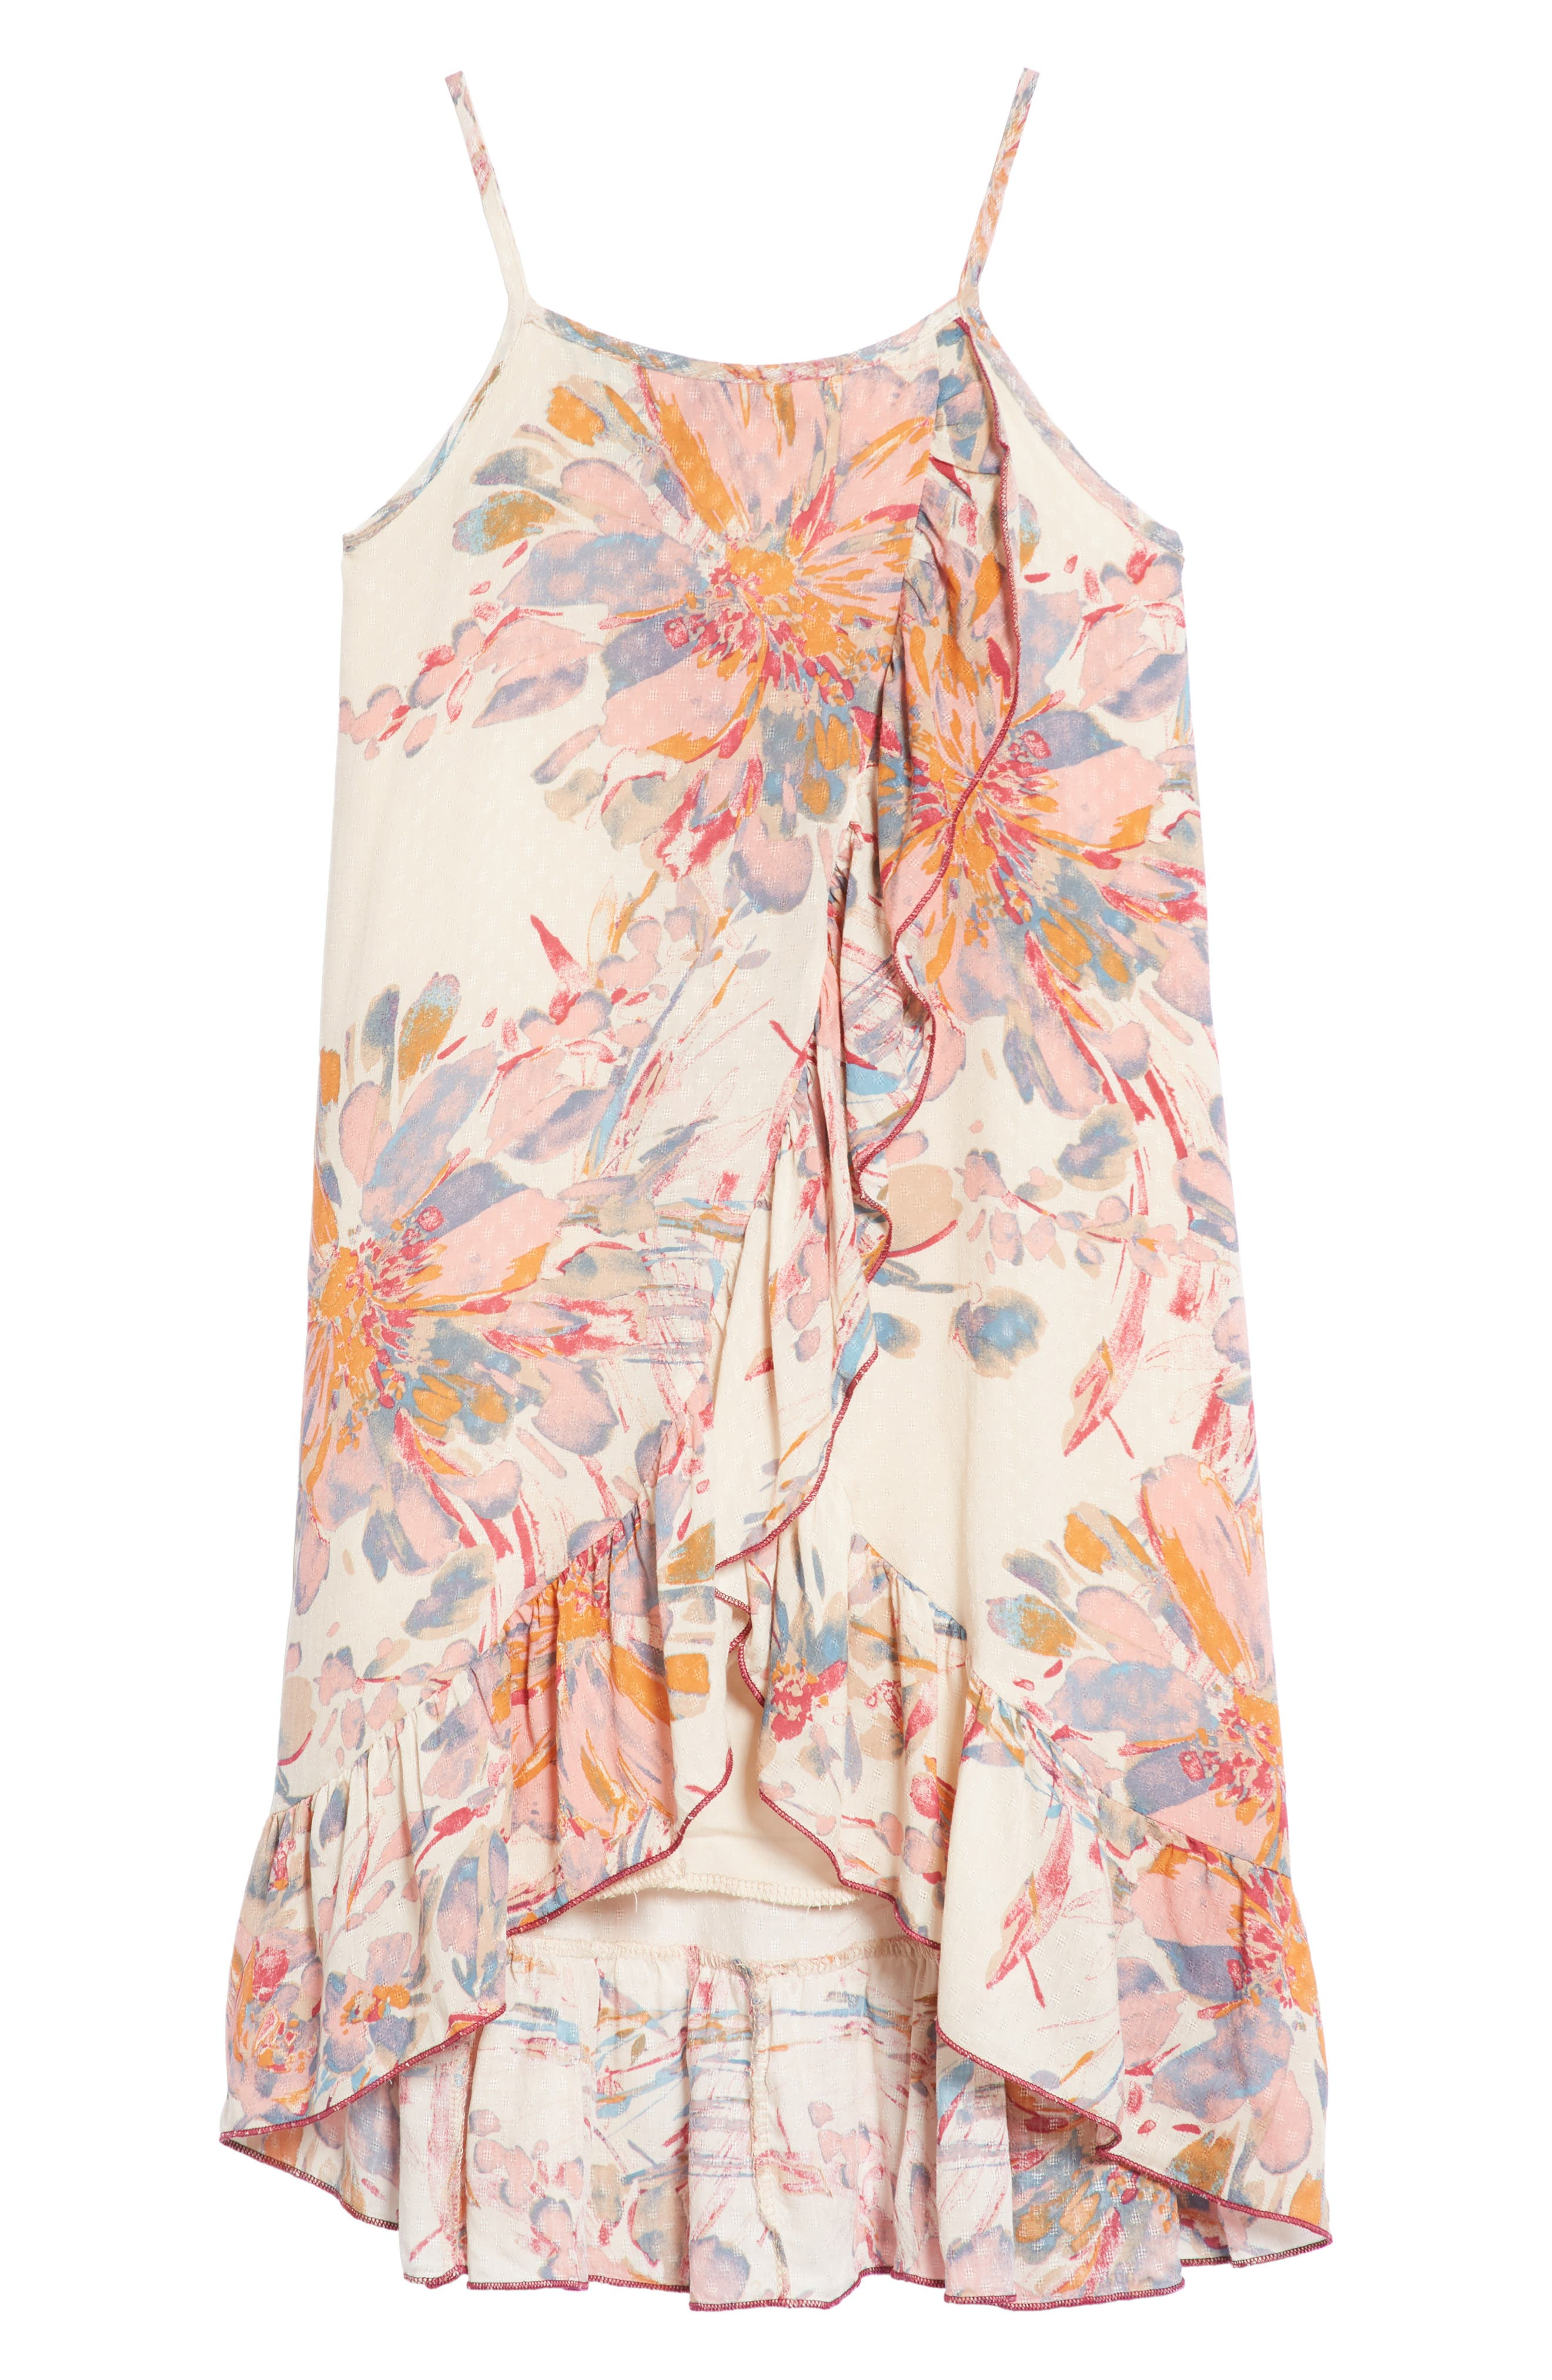 PPLA Zinnia Floral Ruffle Sundress, Main, color, 950